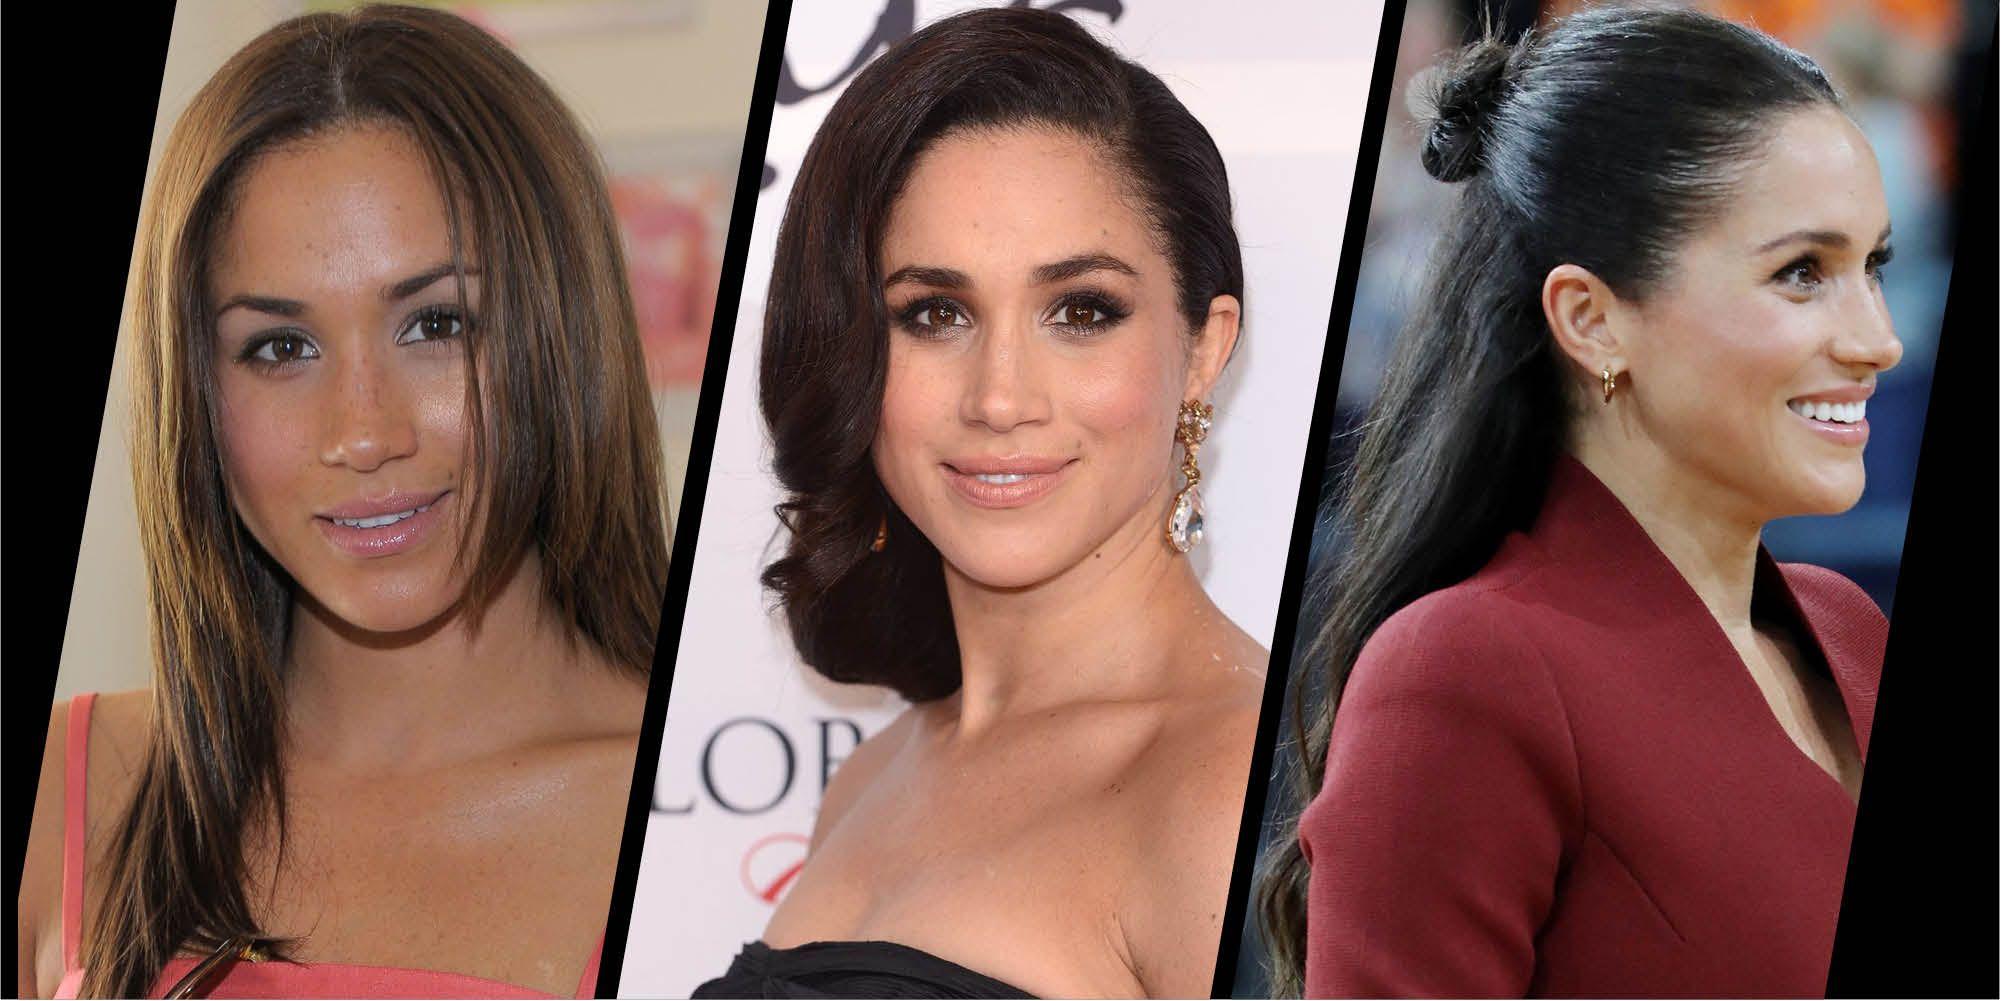 duchess of sussex s beauty looks meghan markle s hair and make up duchess of sussex s beauty looks